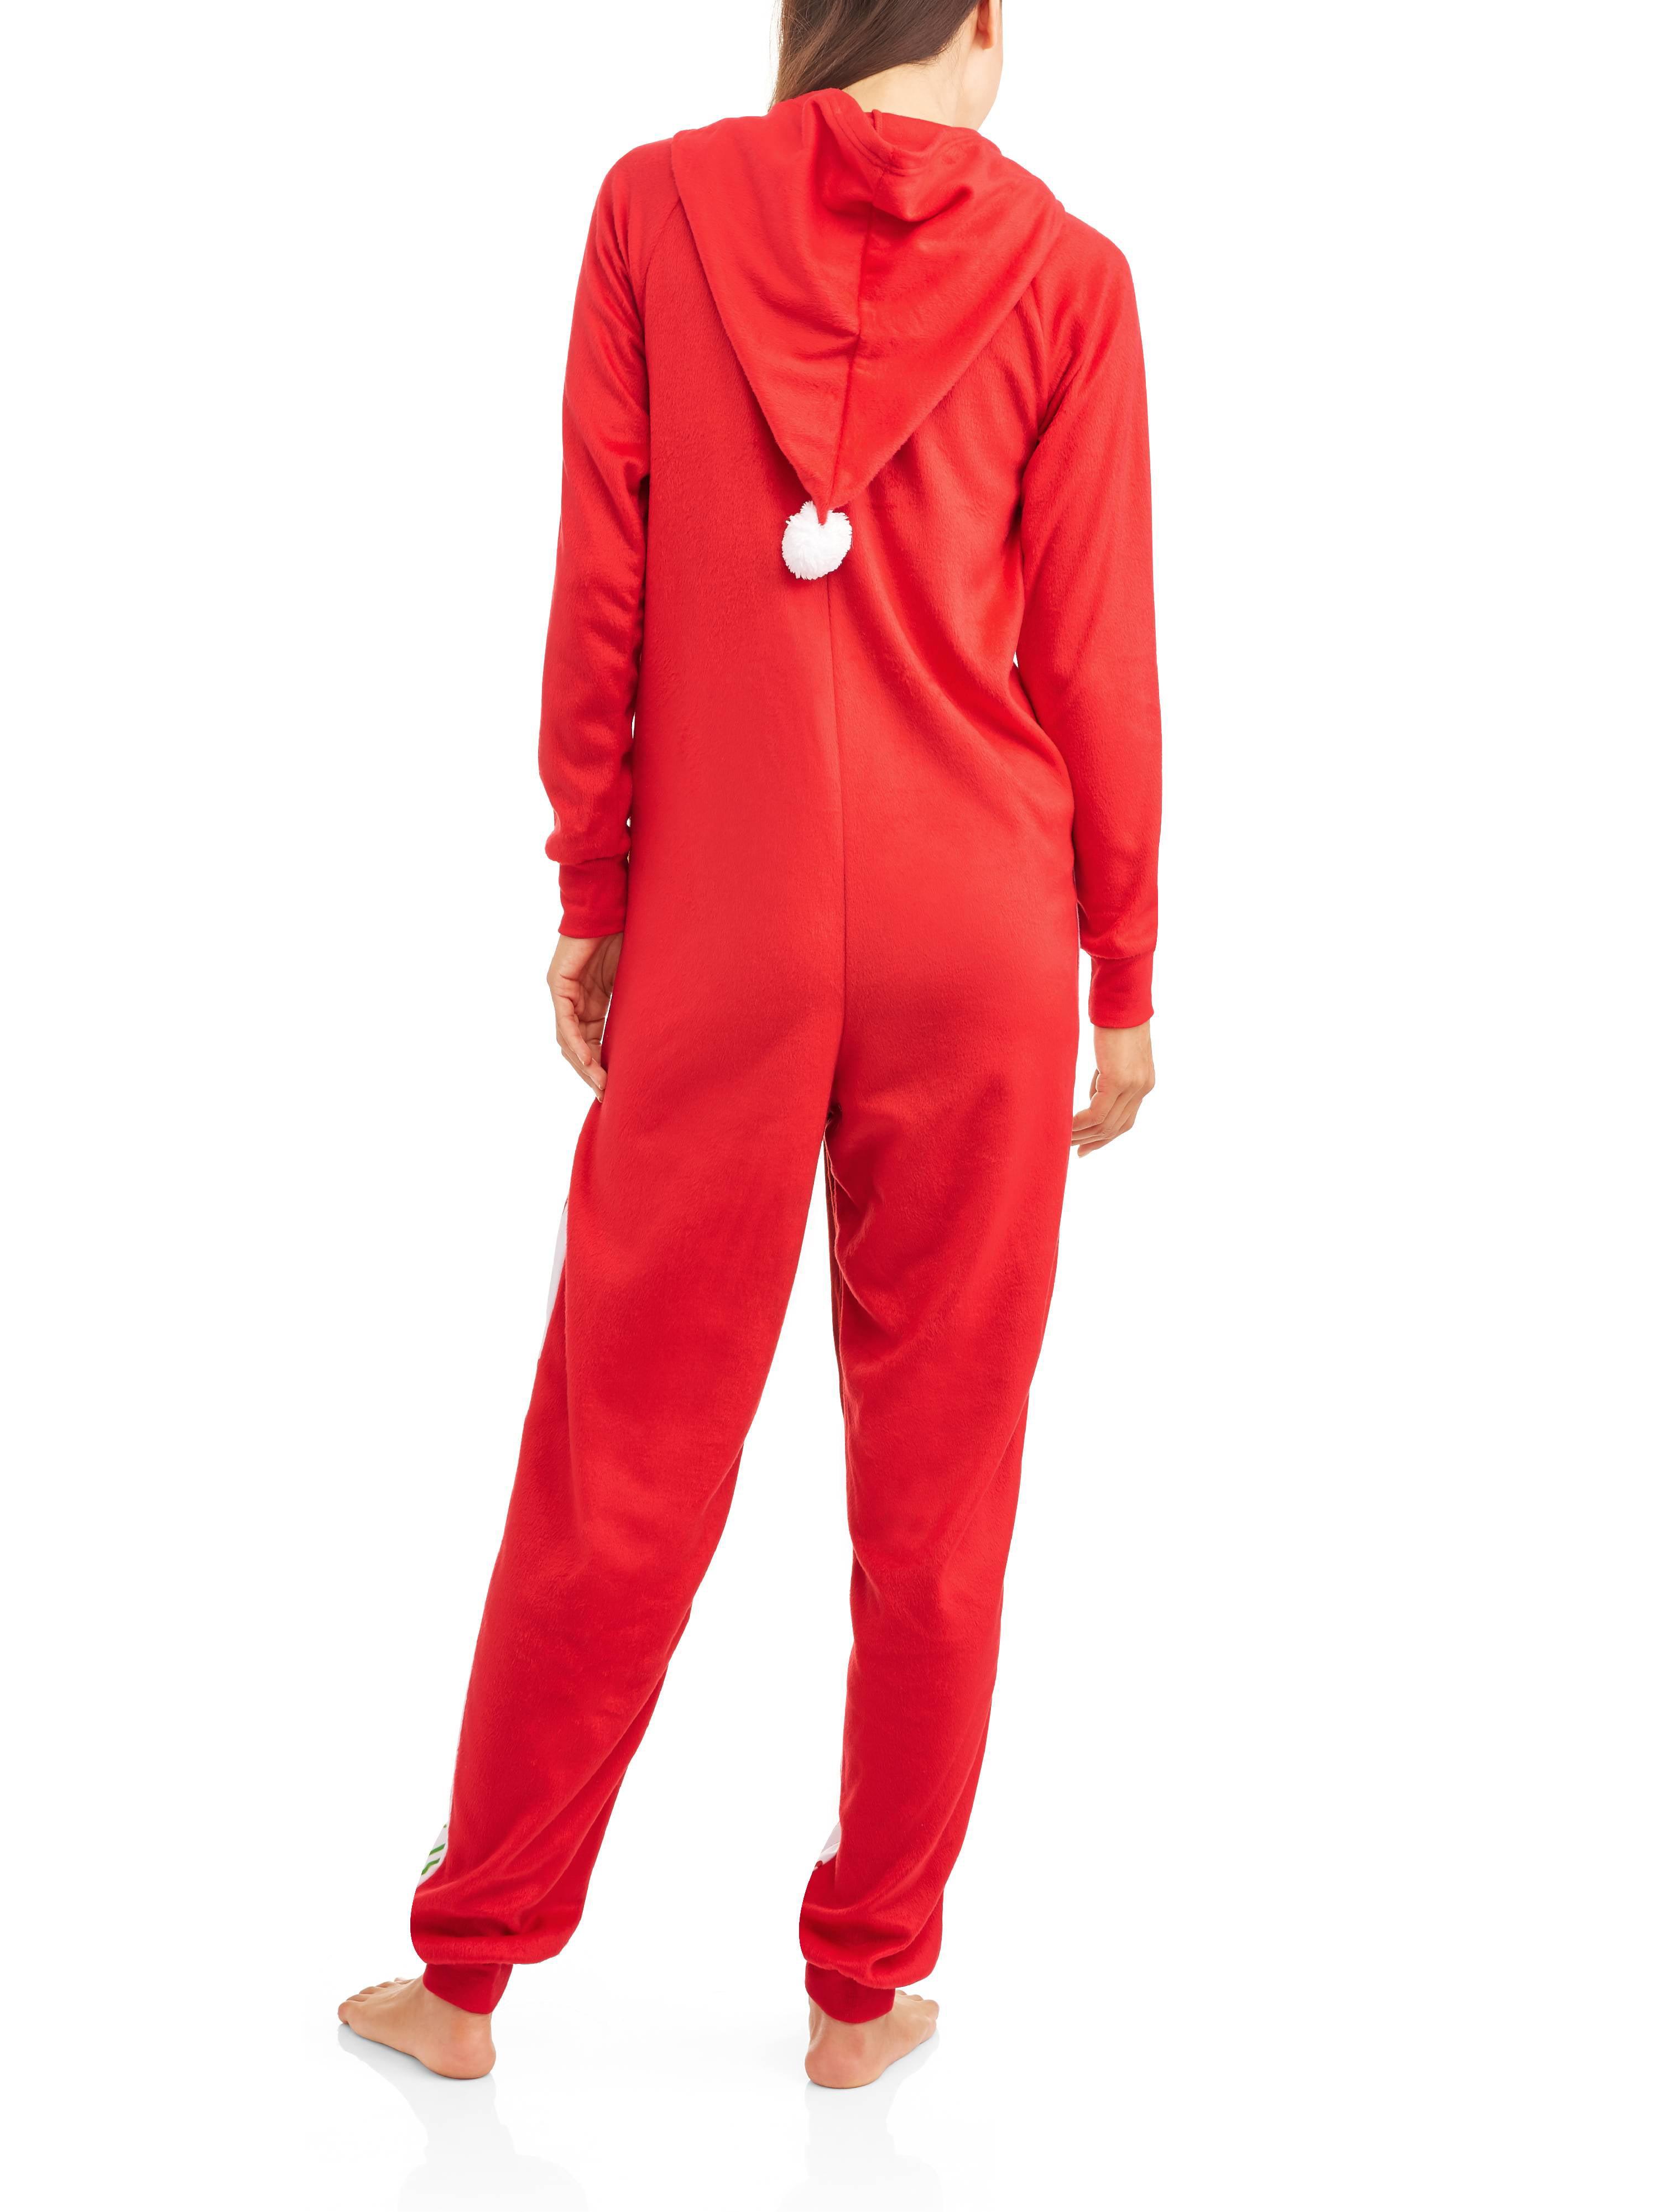 0d00160a35 Elf on Shelf - Elf on the Shelf Women s and Women s Plus Licensed Sleepwear  Adult One Piece Costume Union Suit Pajama (XS-3X) - Walmart.com